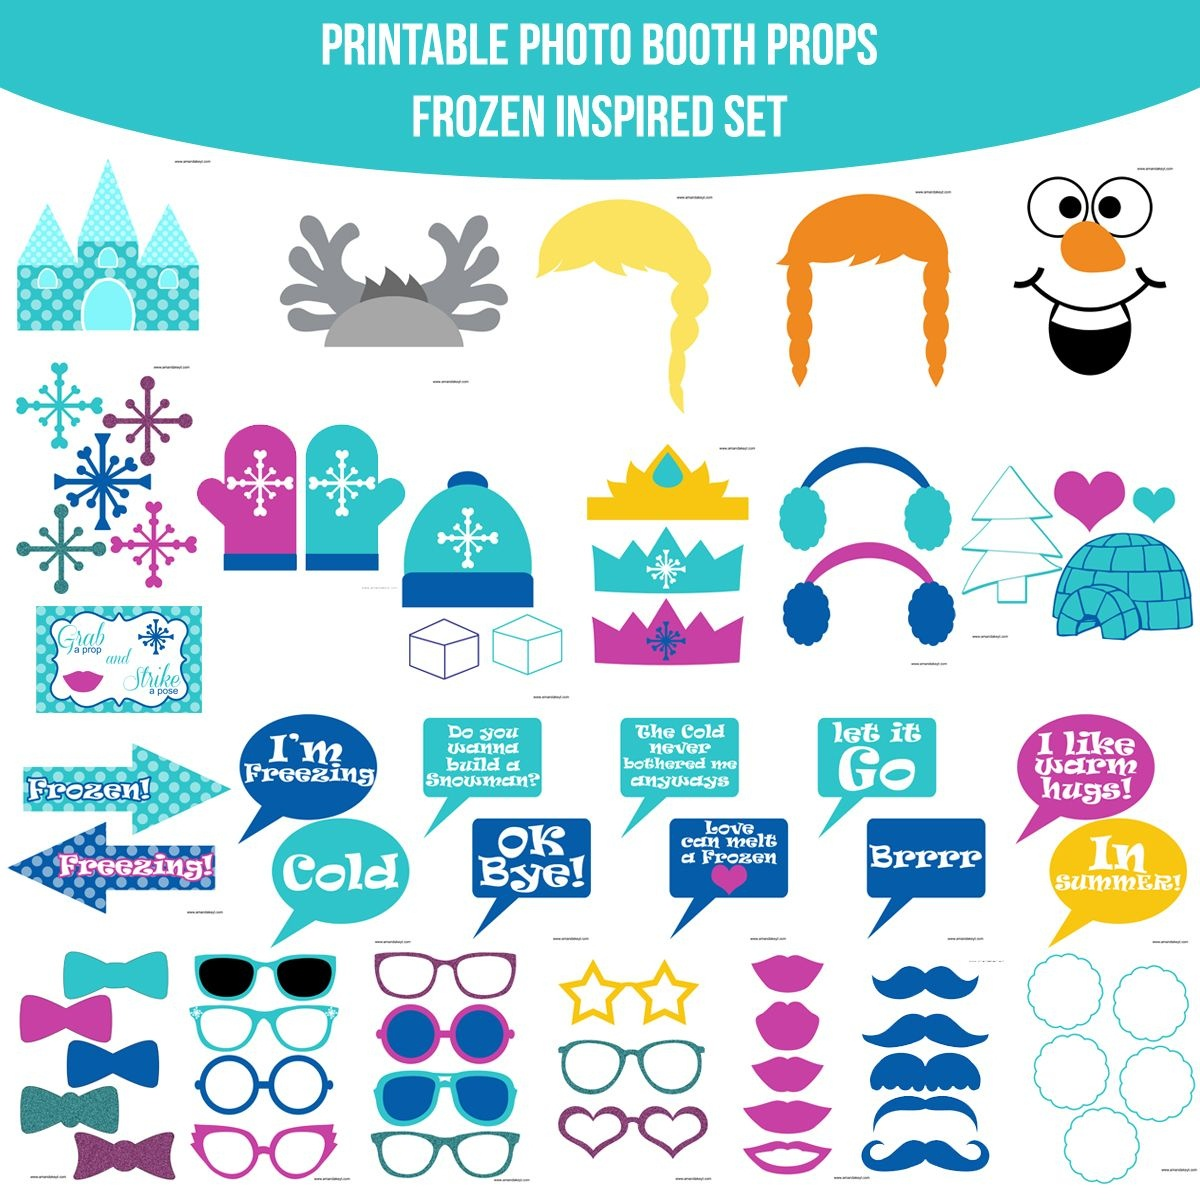 Instant Download Frozen Inspired Printable Photo Booth Prop Set - Free Printable Frozen Photo Booth Props